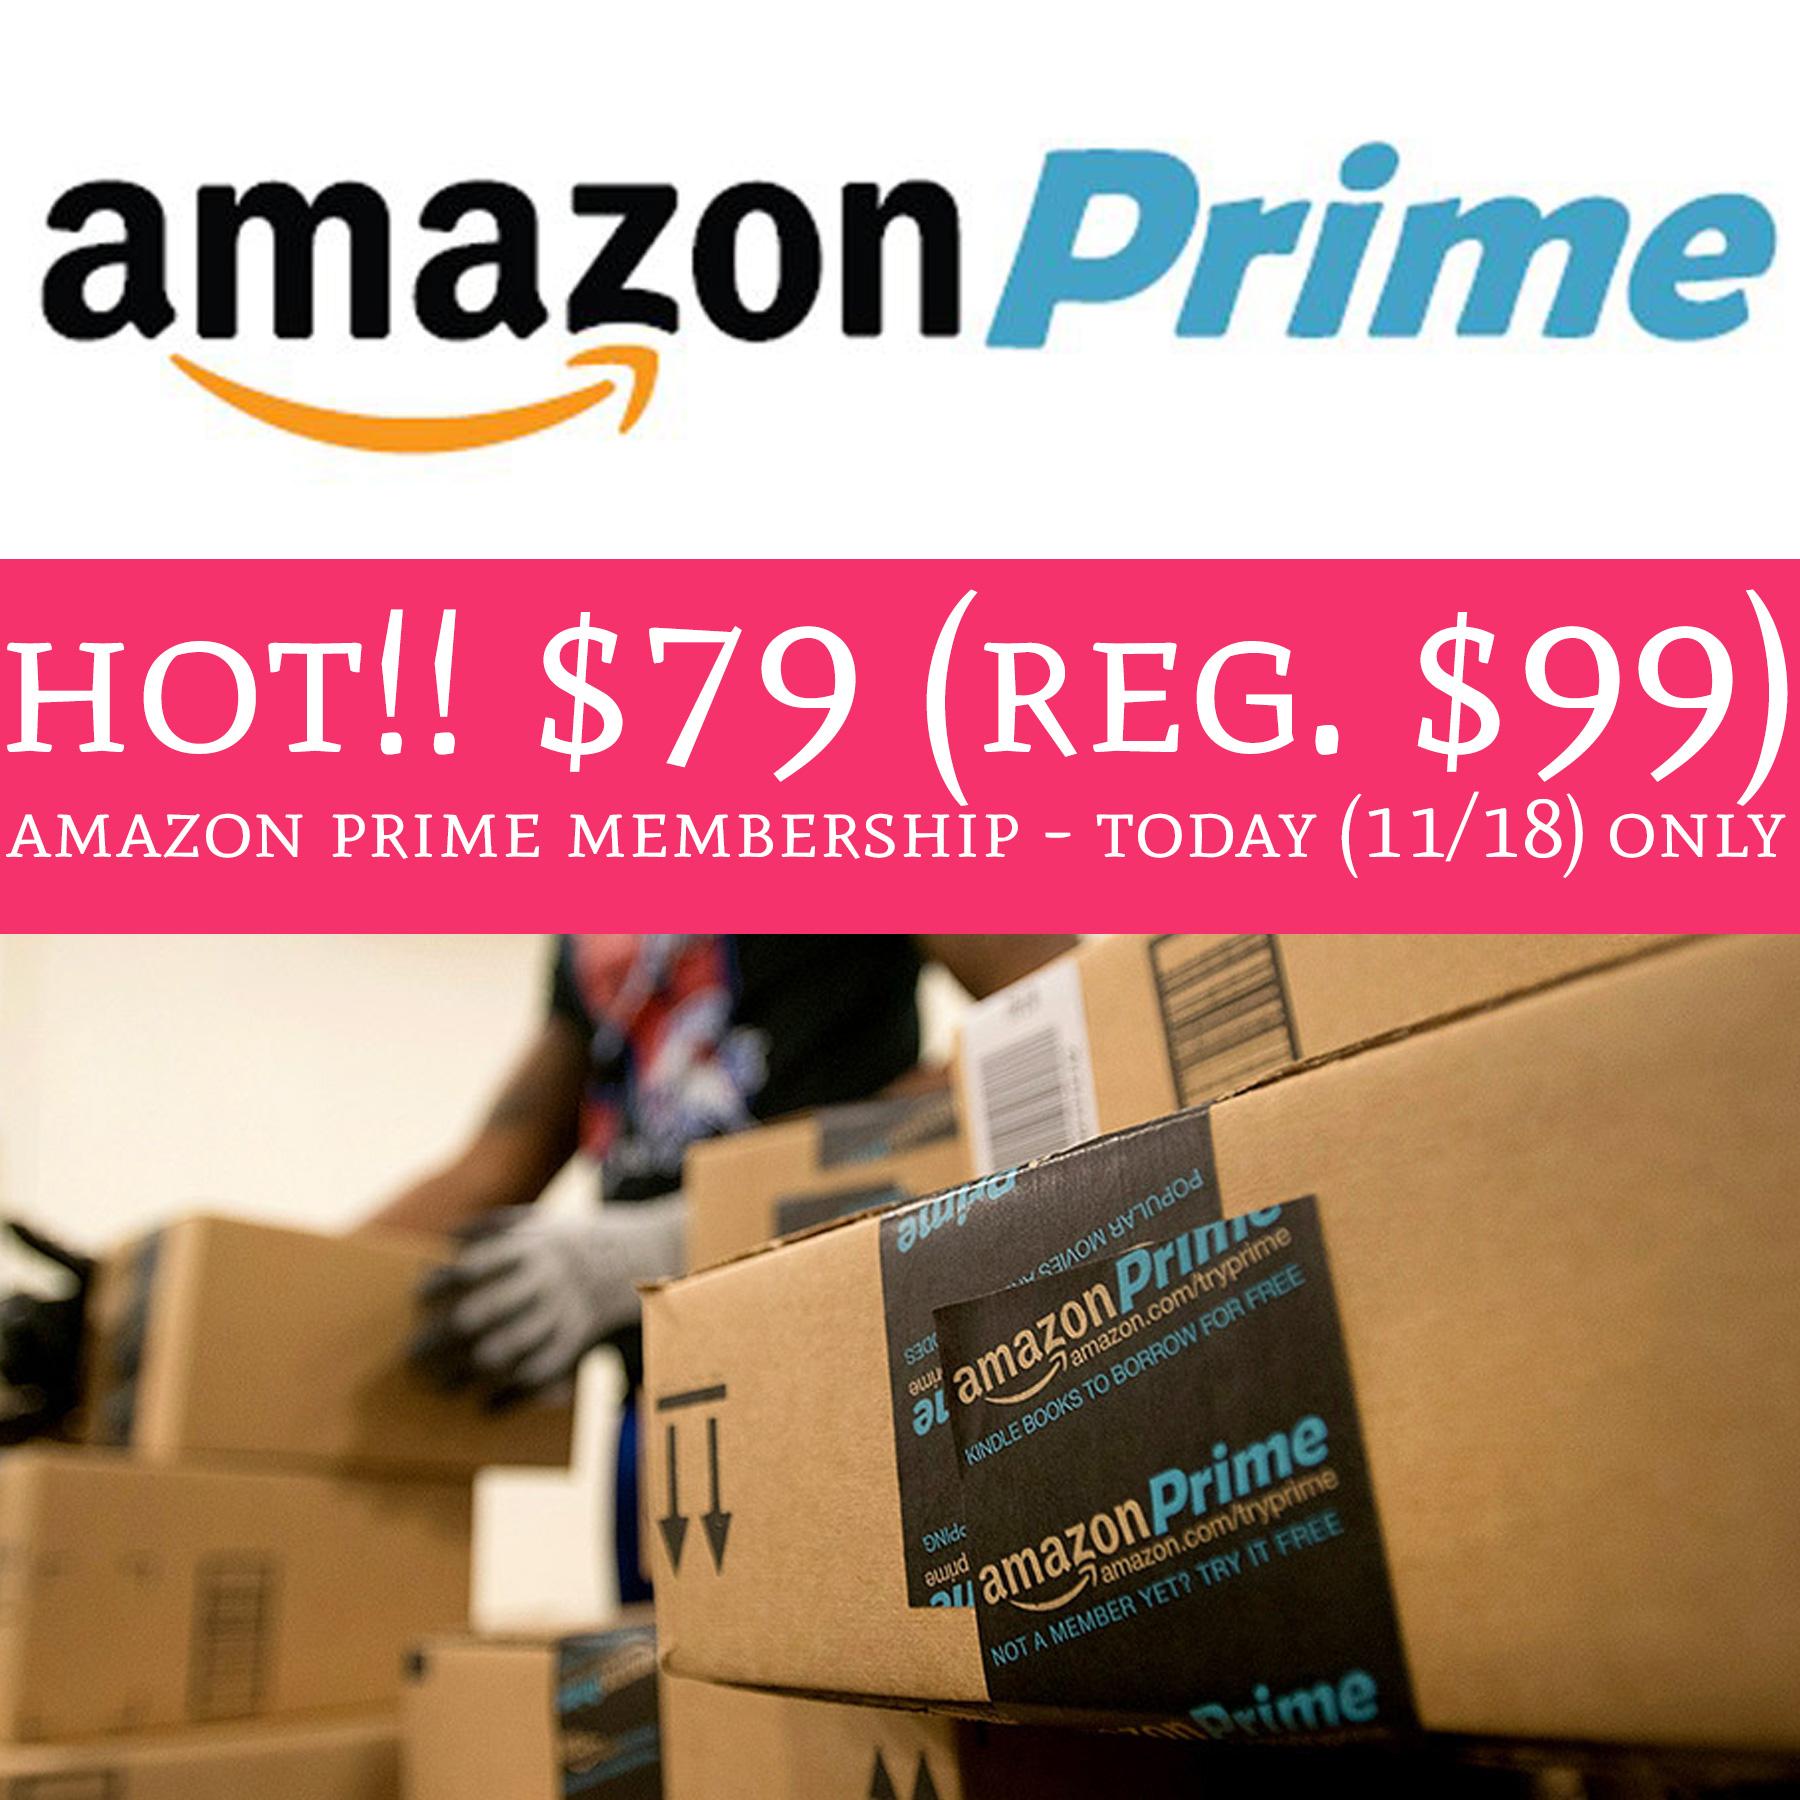 Try amazon prime free again